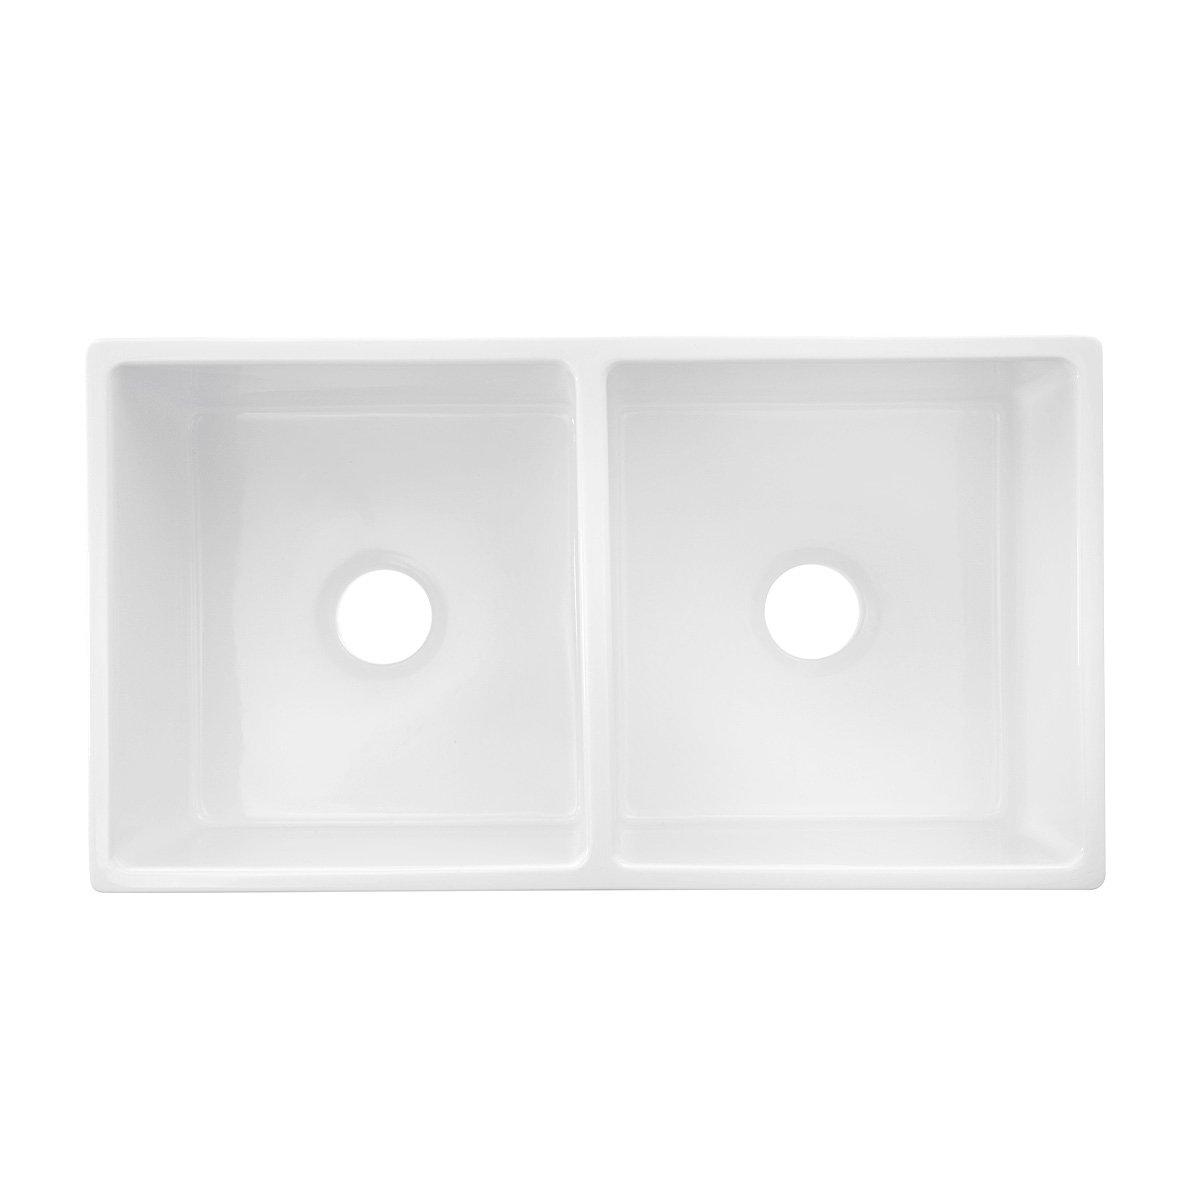 Amazon.com: Highpoint Collection Italian Fireclay Double Bowl ...